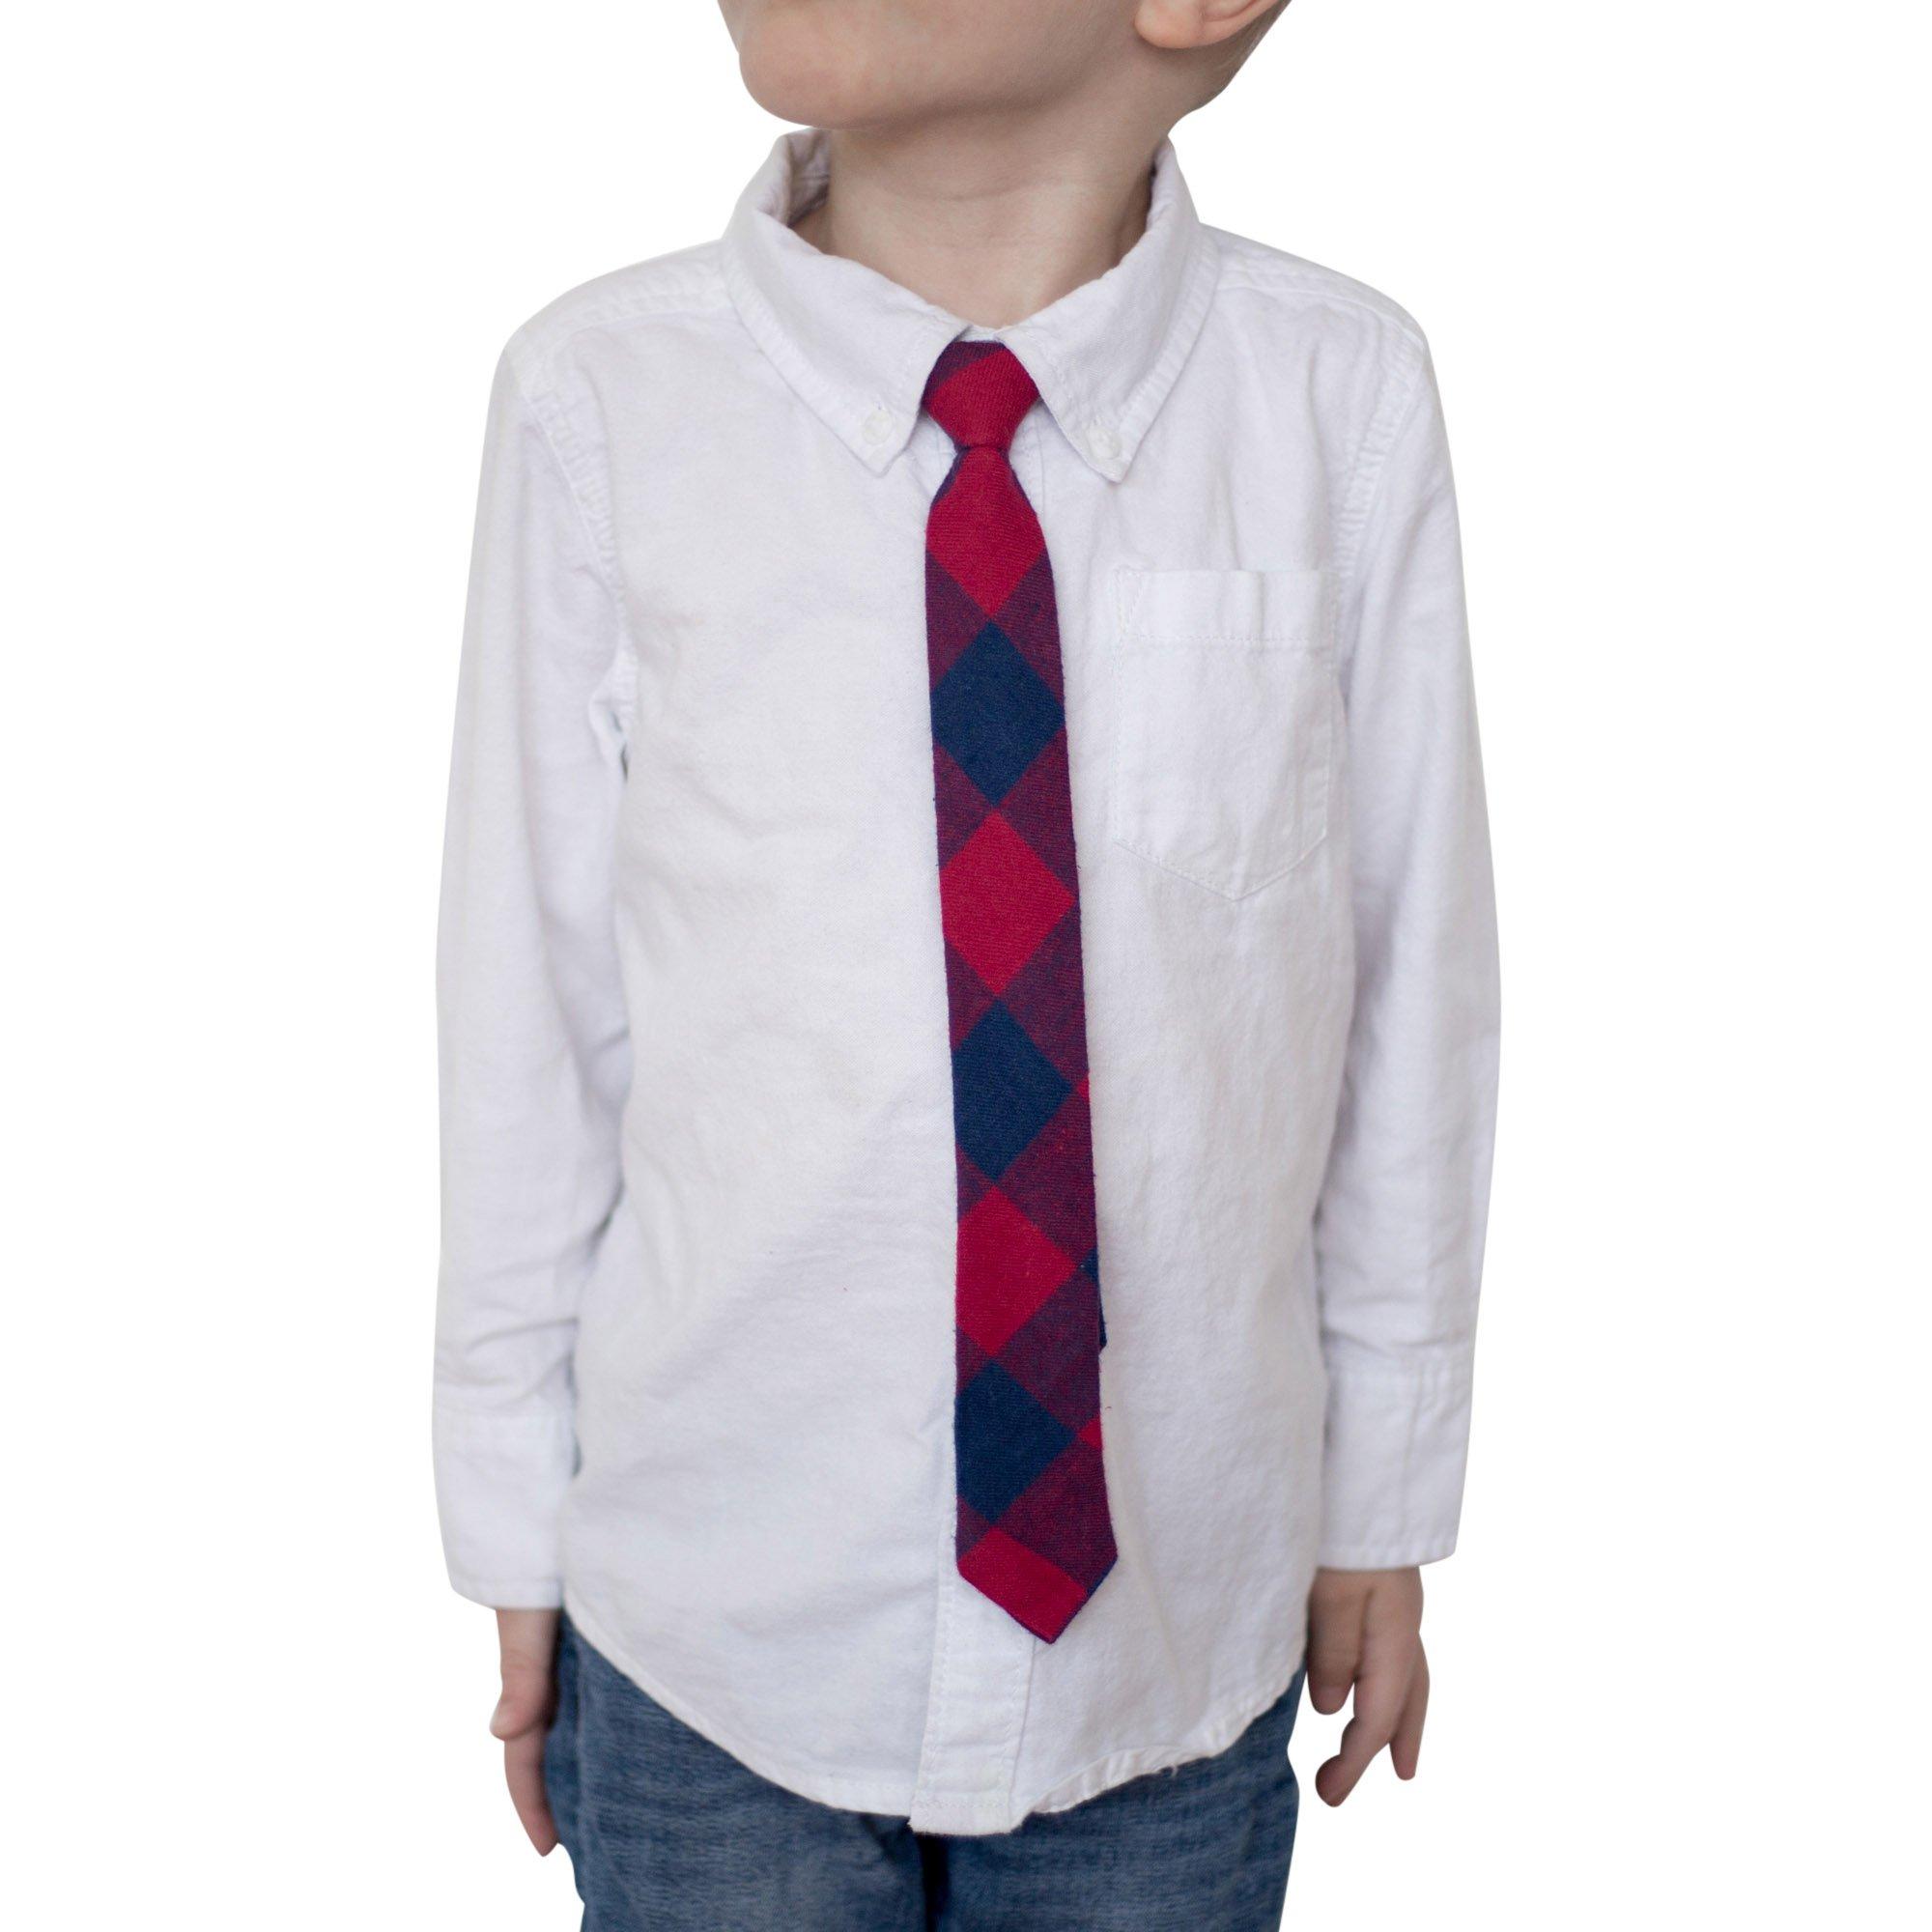 Kids Cotton Skinny Tie, Red Plaid 1.5'' (4 cm)